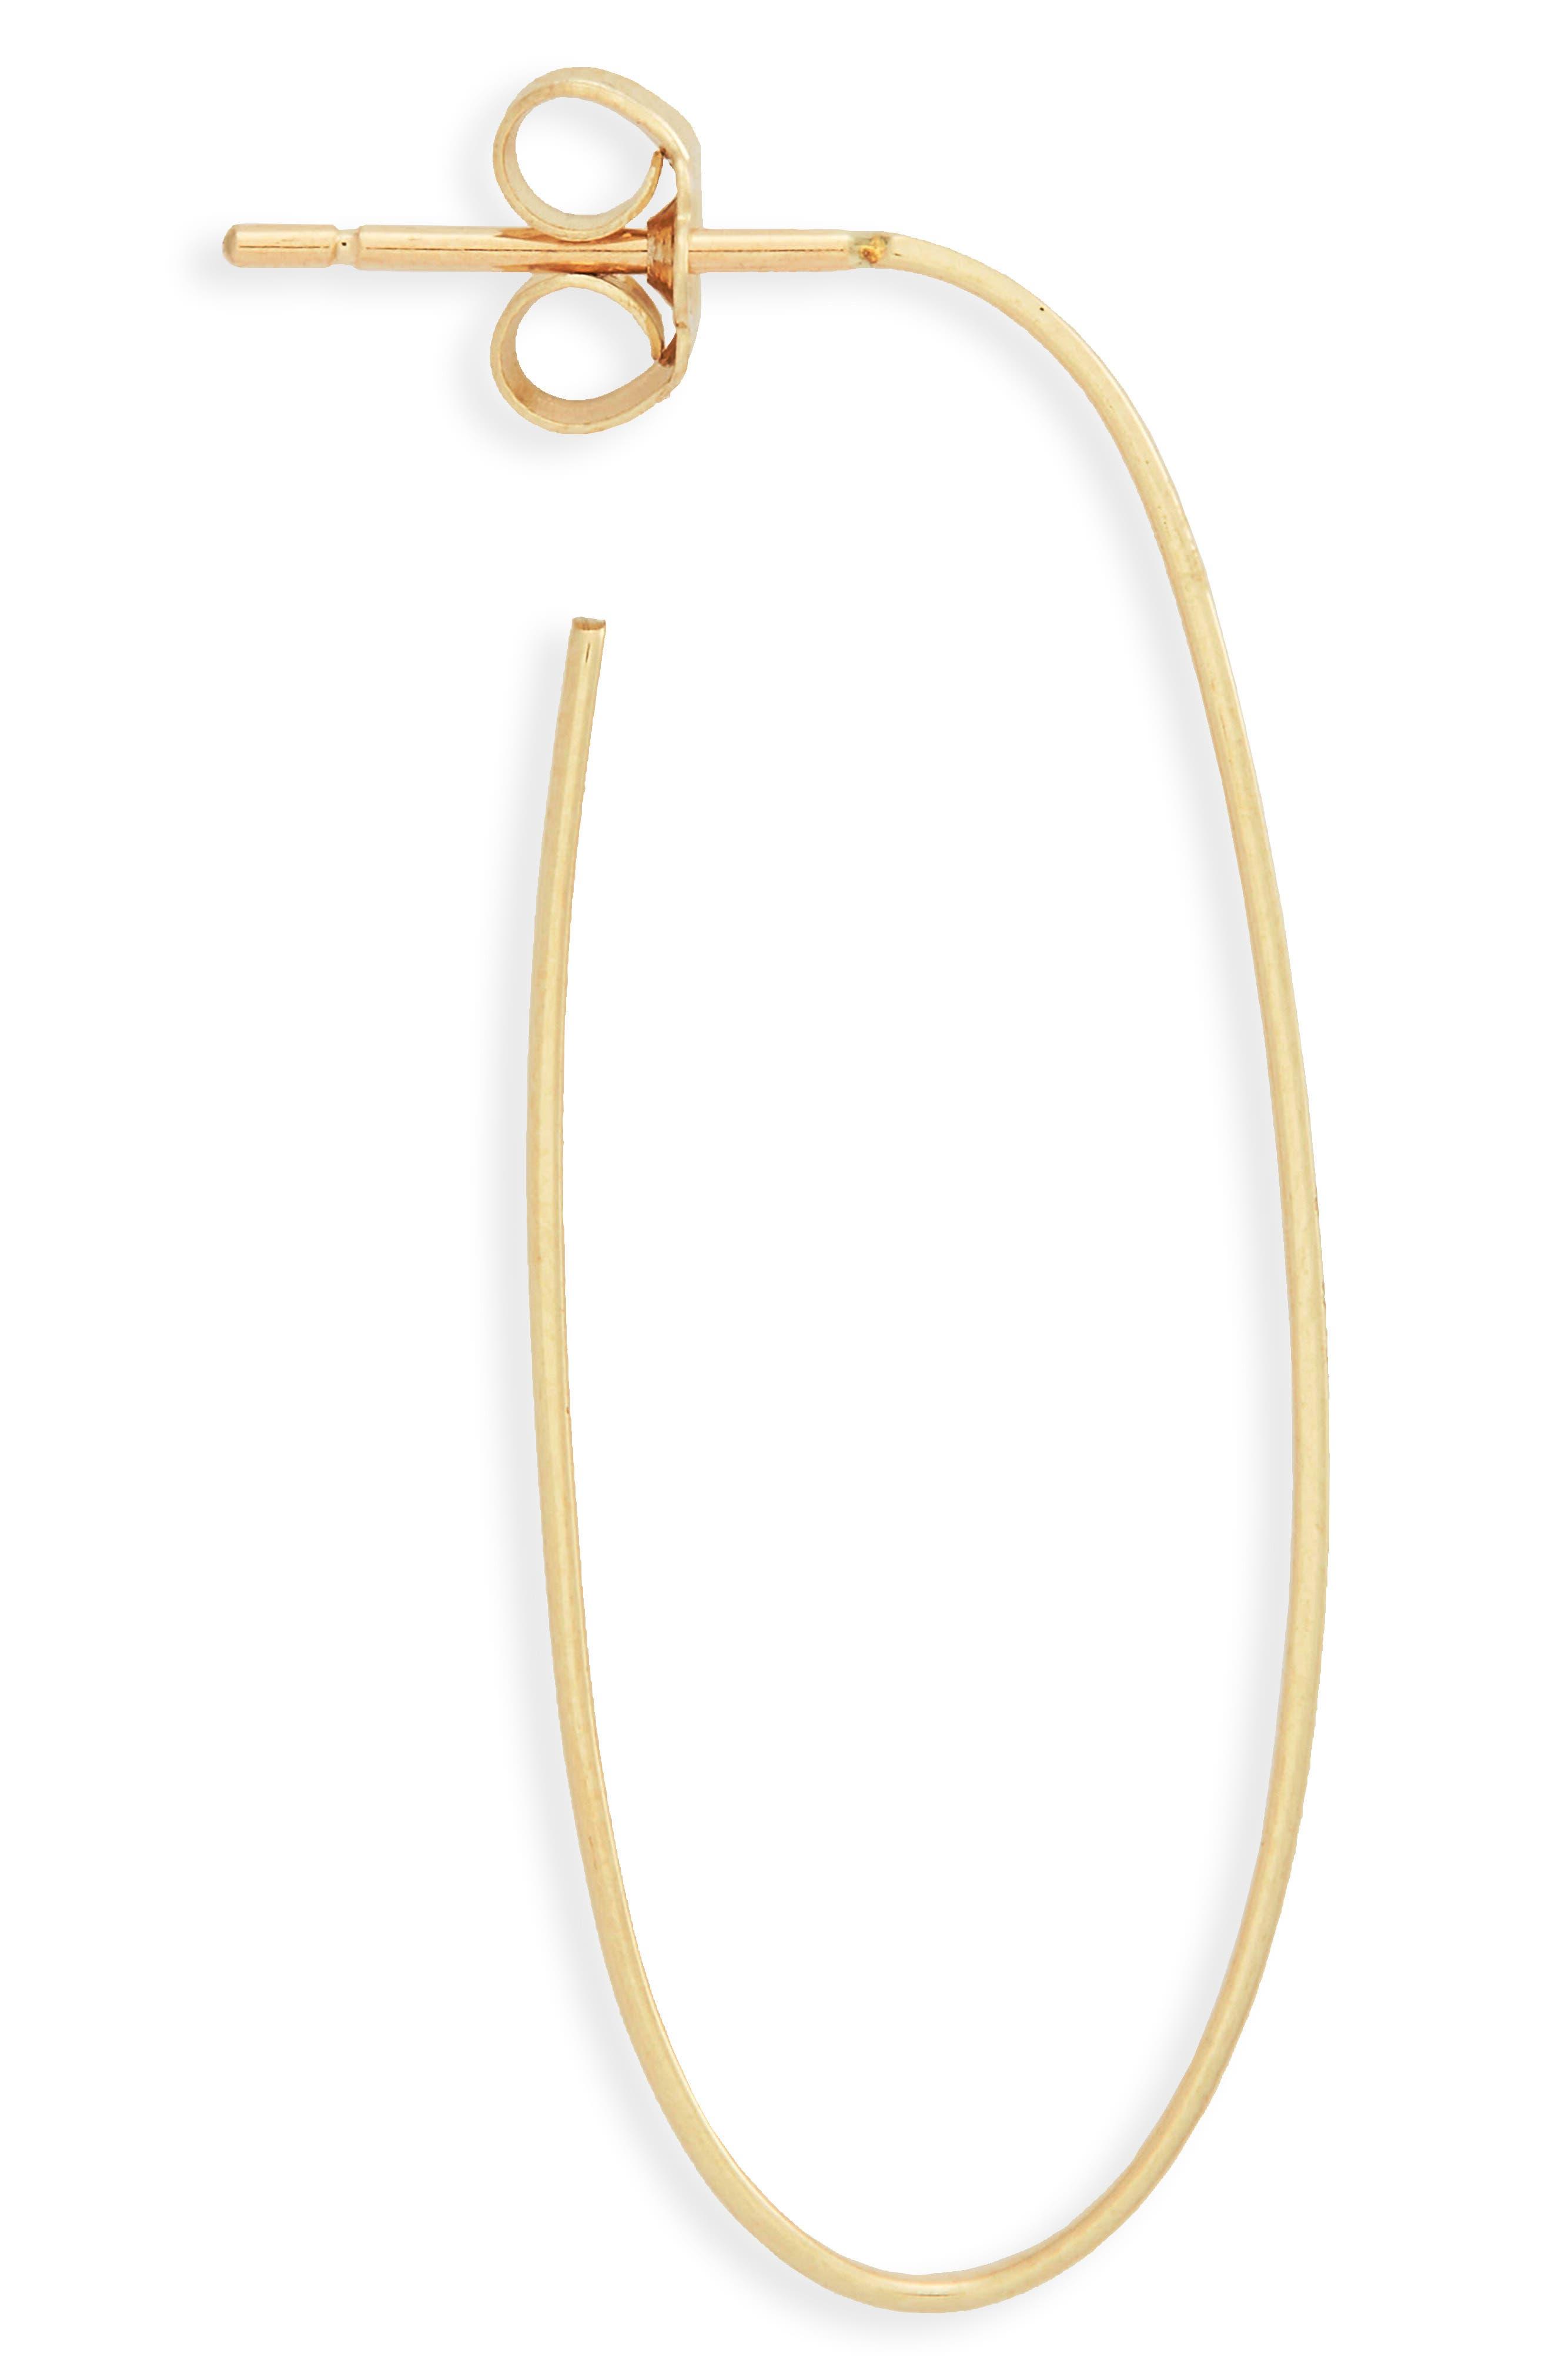 Flat Long Oval Hoop Earrings,                             Alternate thumbnail 4, color,                             YELLOW GOLD